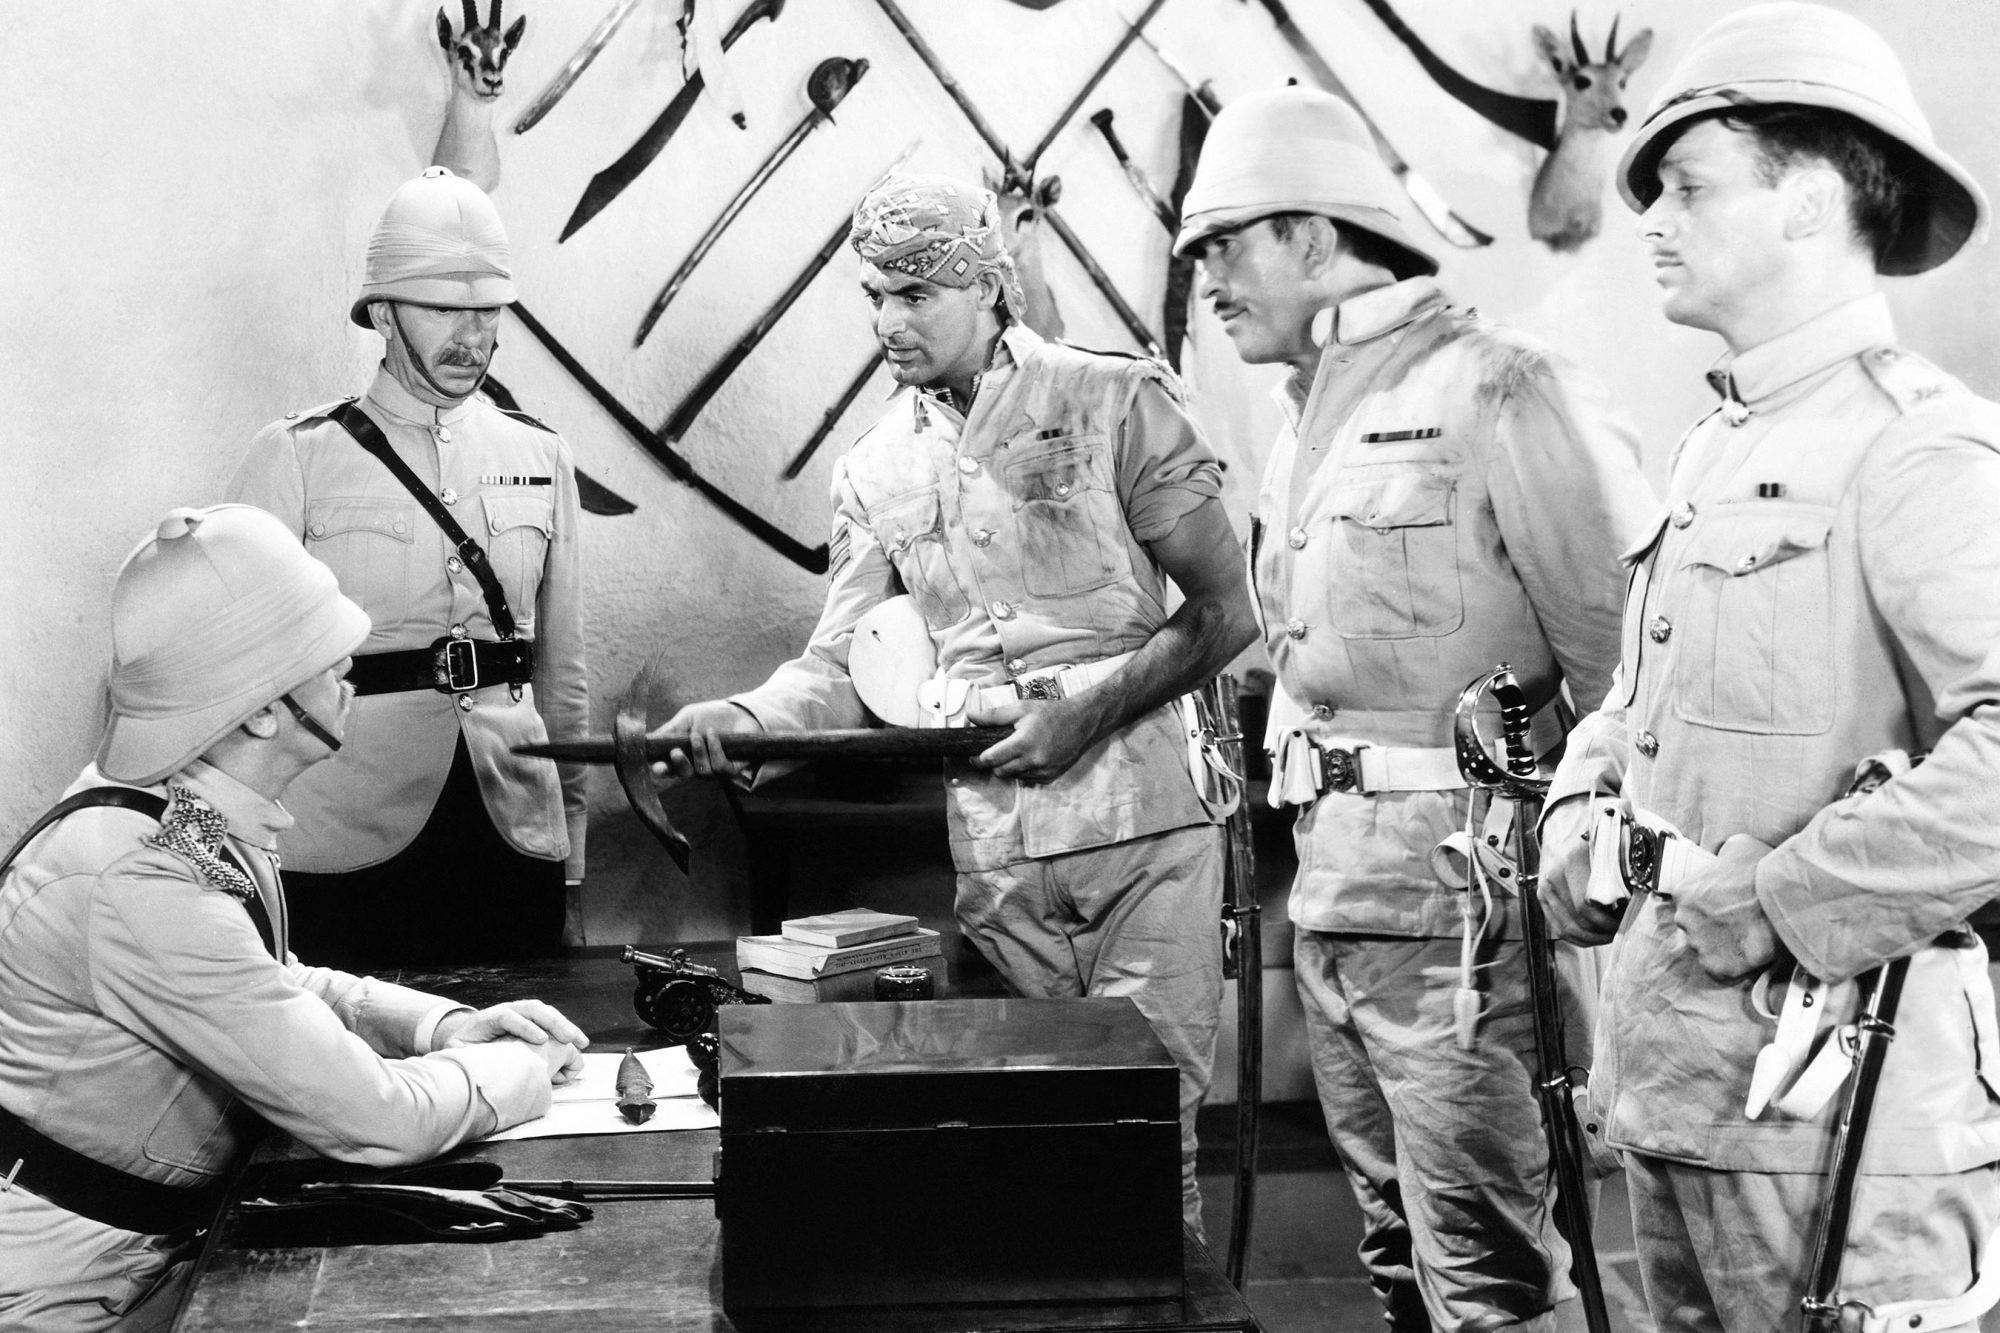 GUNGA DIN, standing from left: Lumsden Hare, Cary Grant, Victor McLaglen, Douglas Fairbanks Jr.,